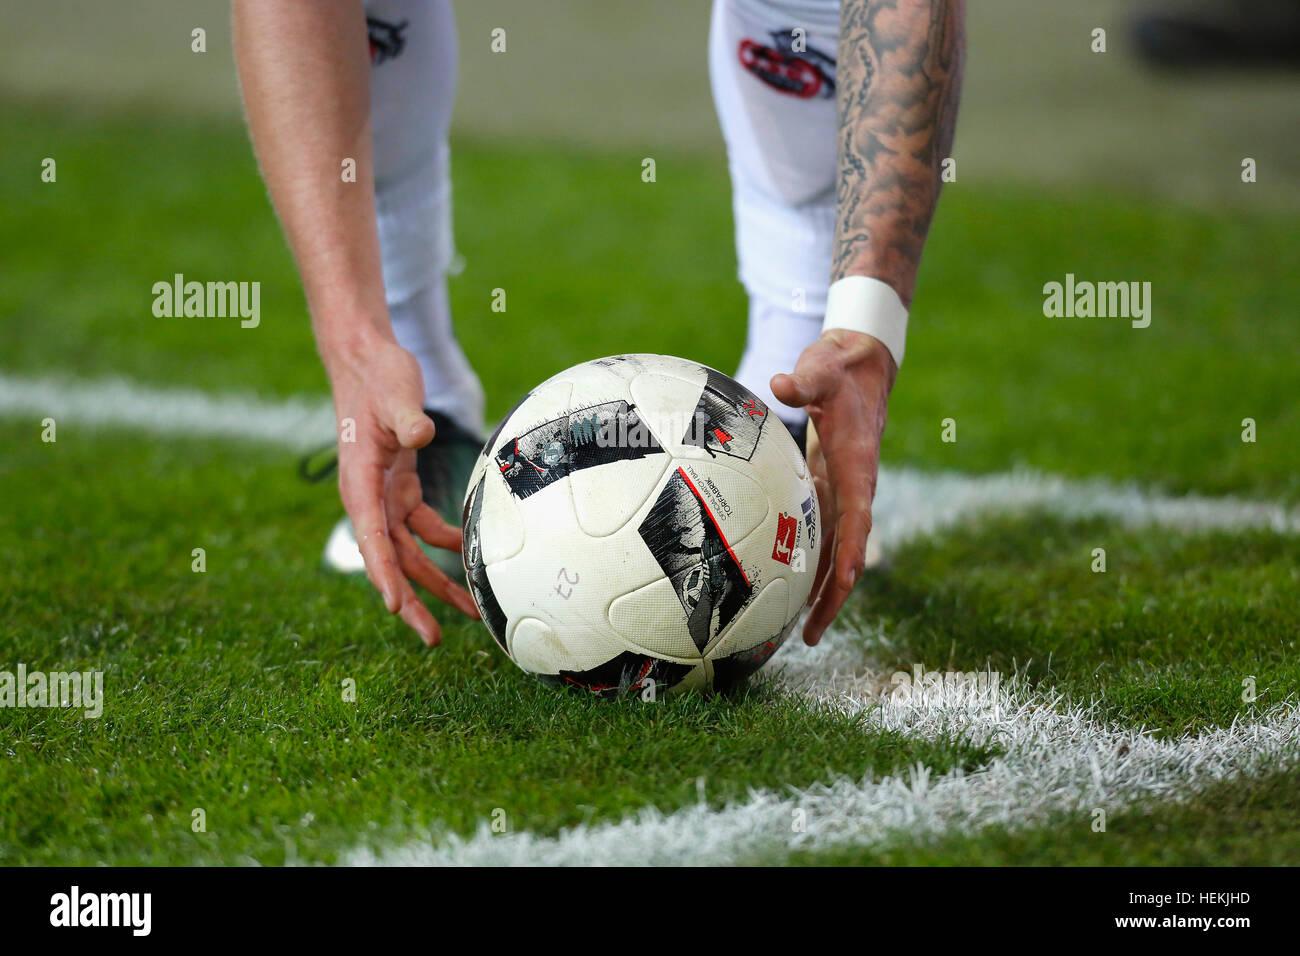 Cologne, Germany. 21st Dec, 2016. Bundesliga matchday 16, 1. FC Koeln - Bayer Leverkusen: Ball am Viertelkreis. - Stock Image